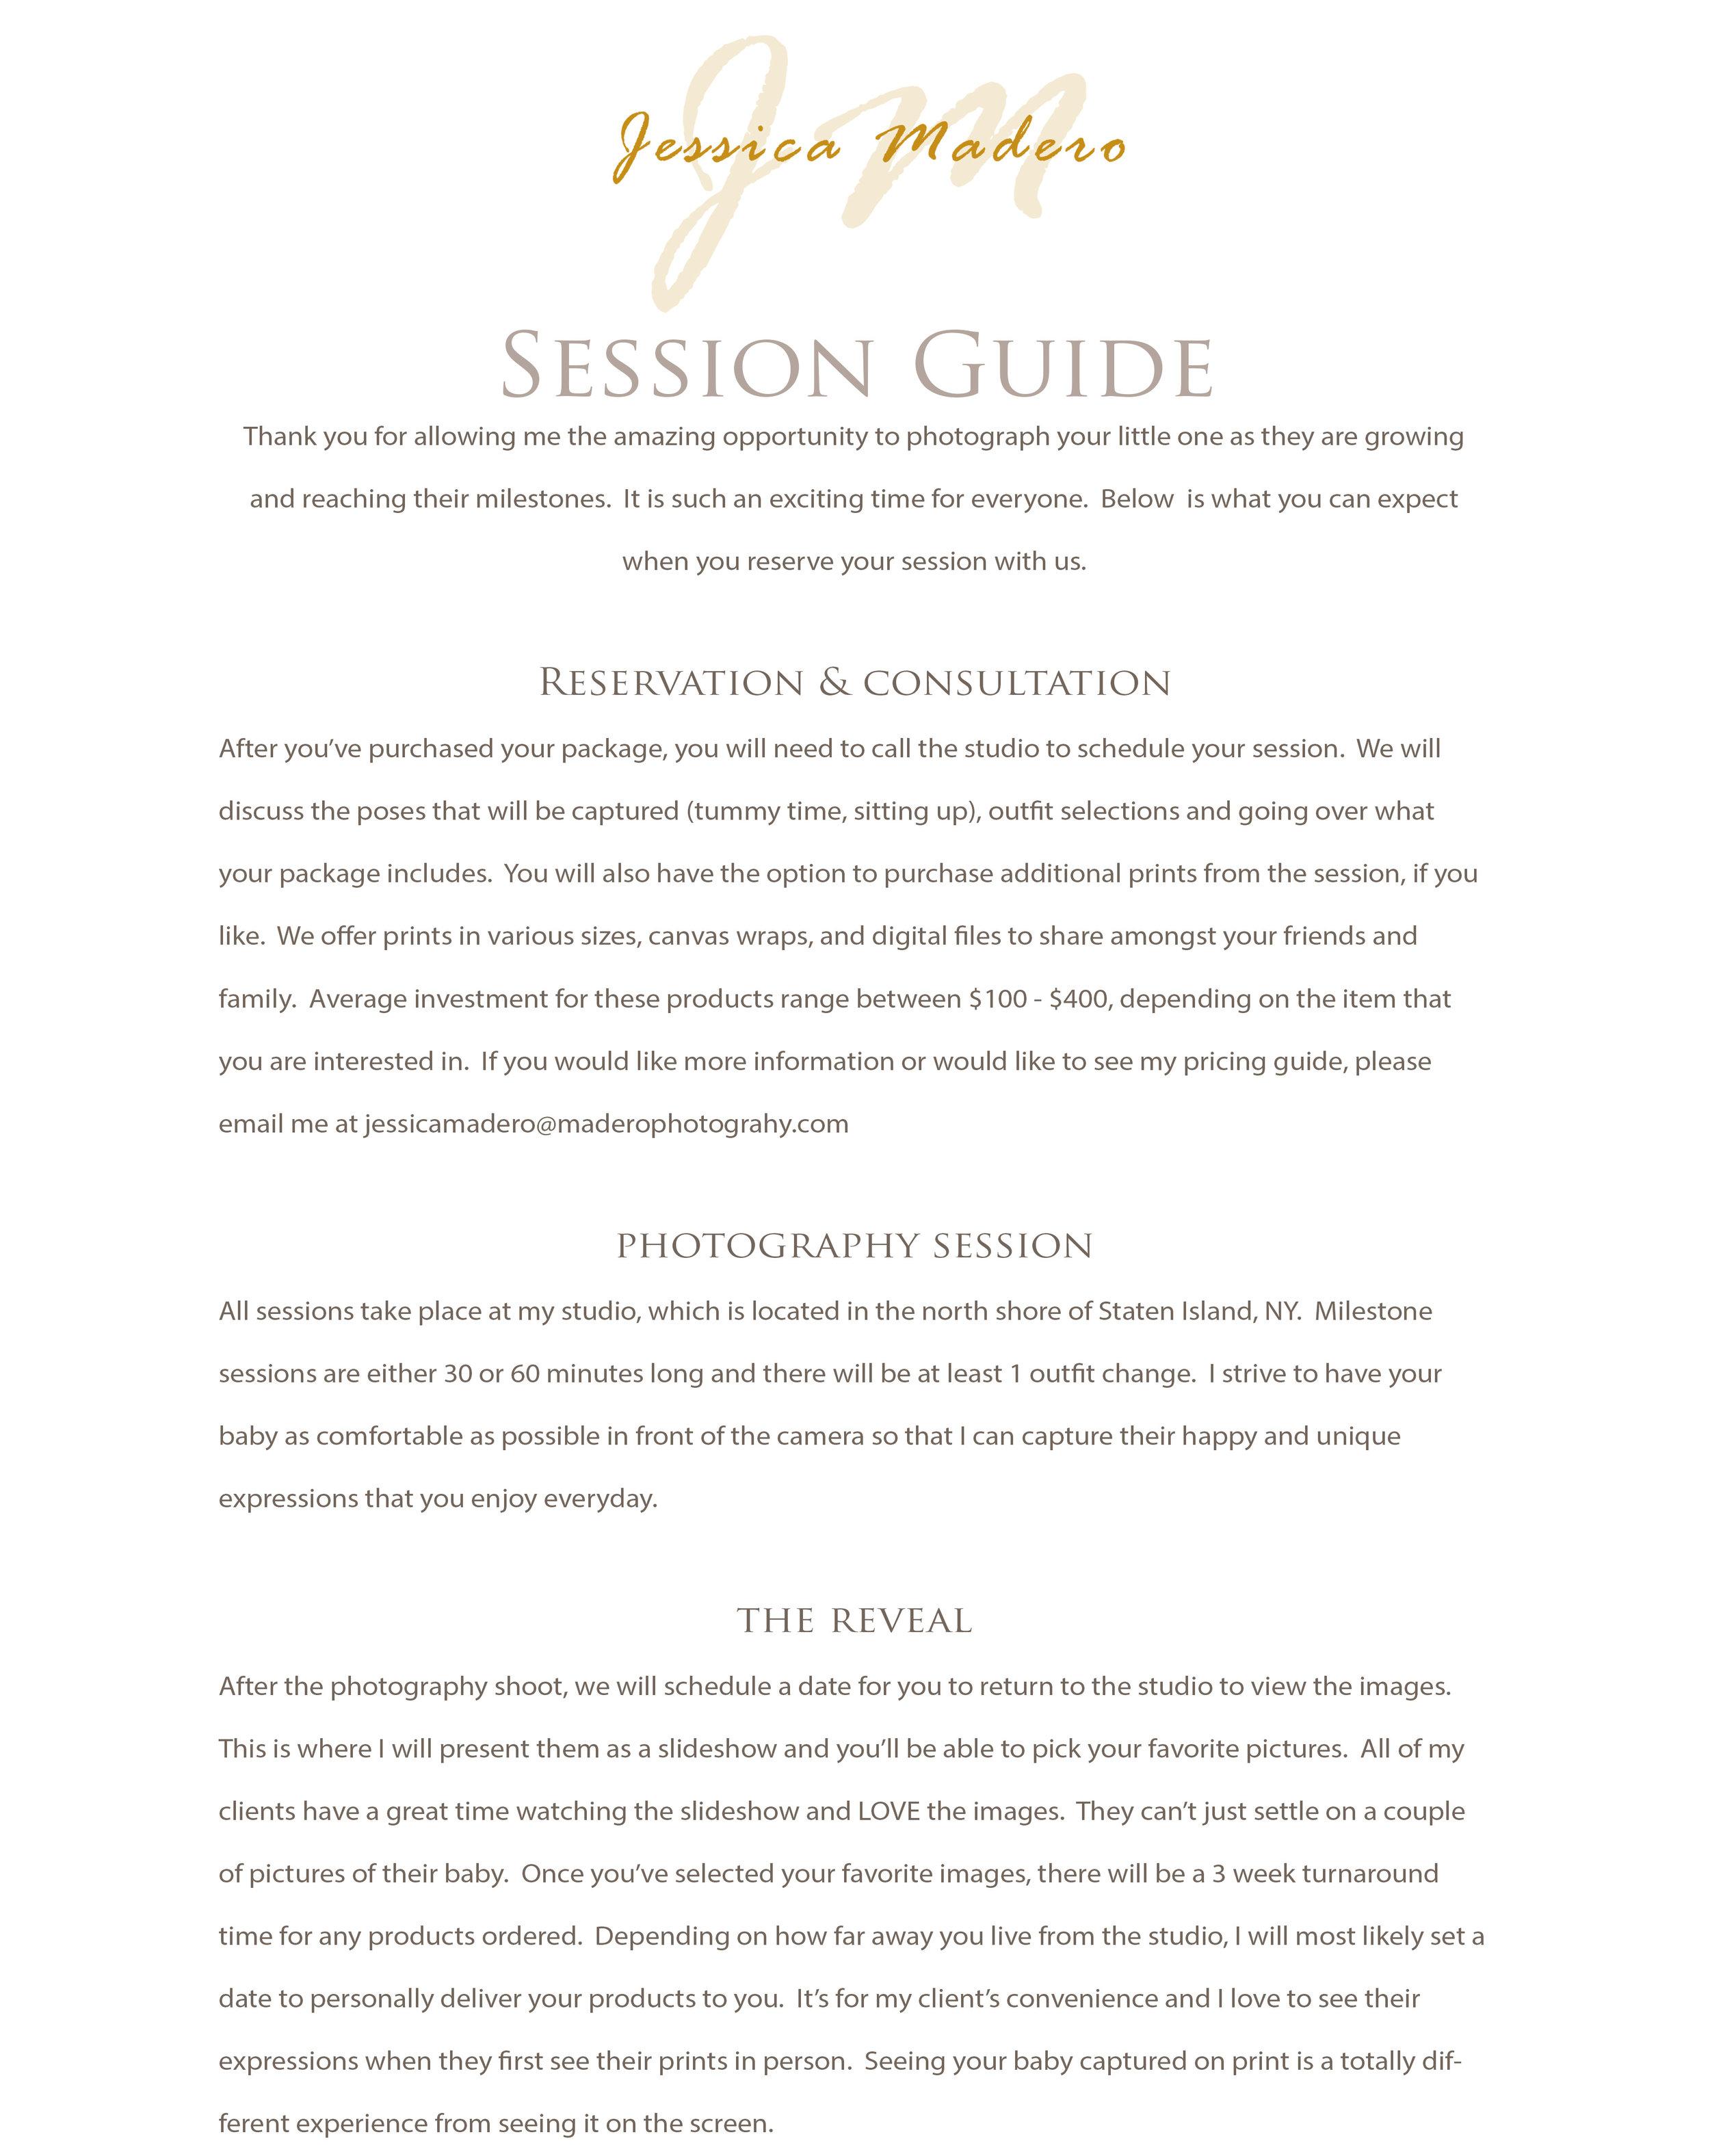 groupon prep guide - Copy.jpg